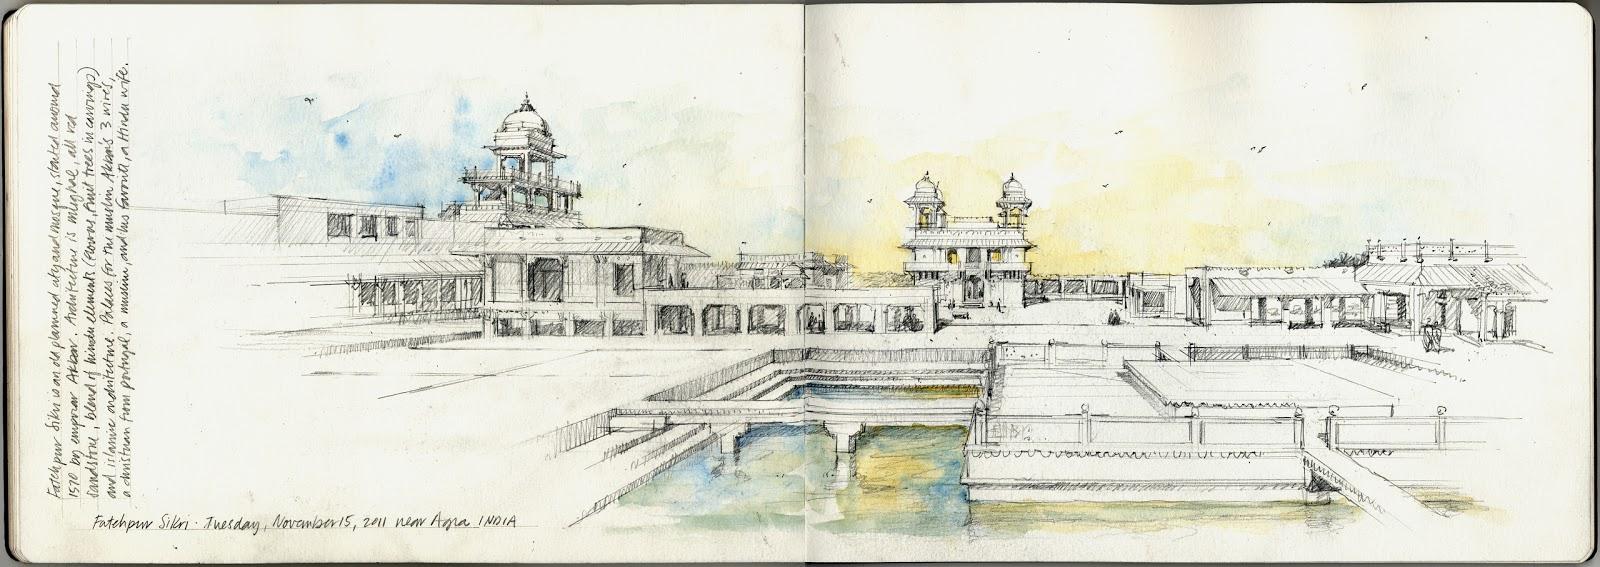 Krob award for travel sketch to india